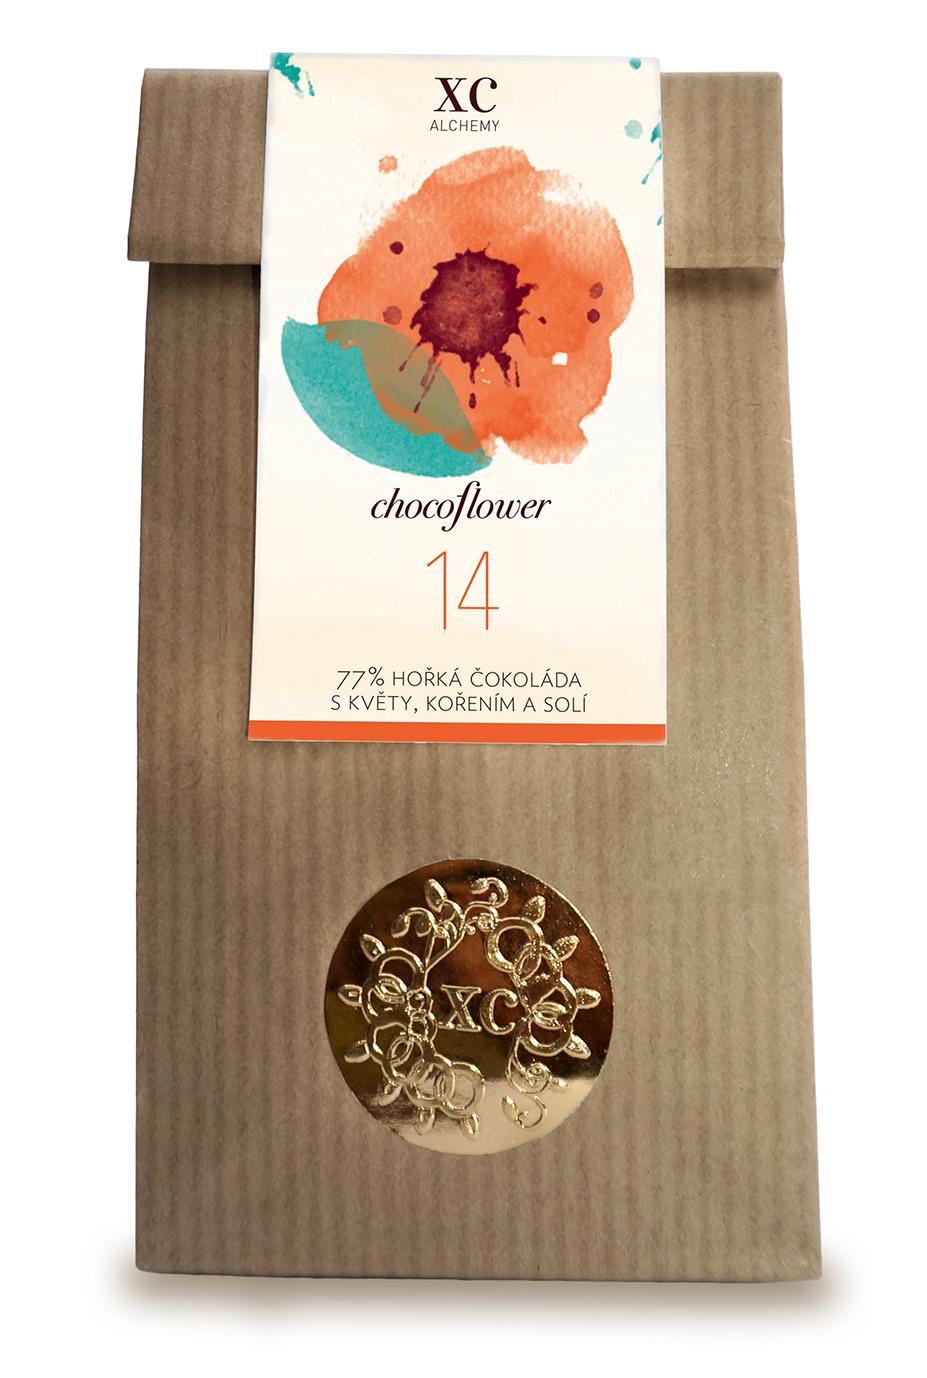 xc chocoflower 14 verve L